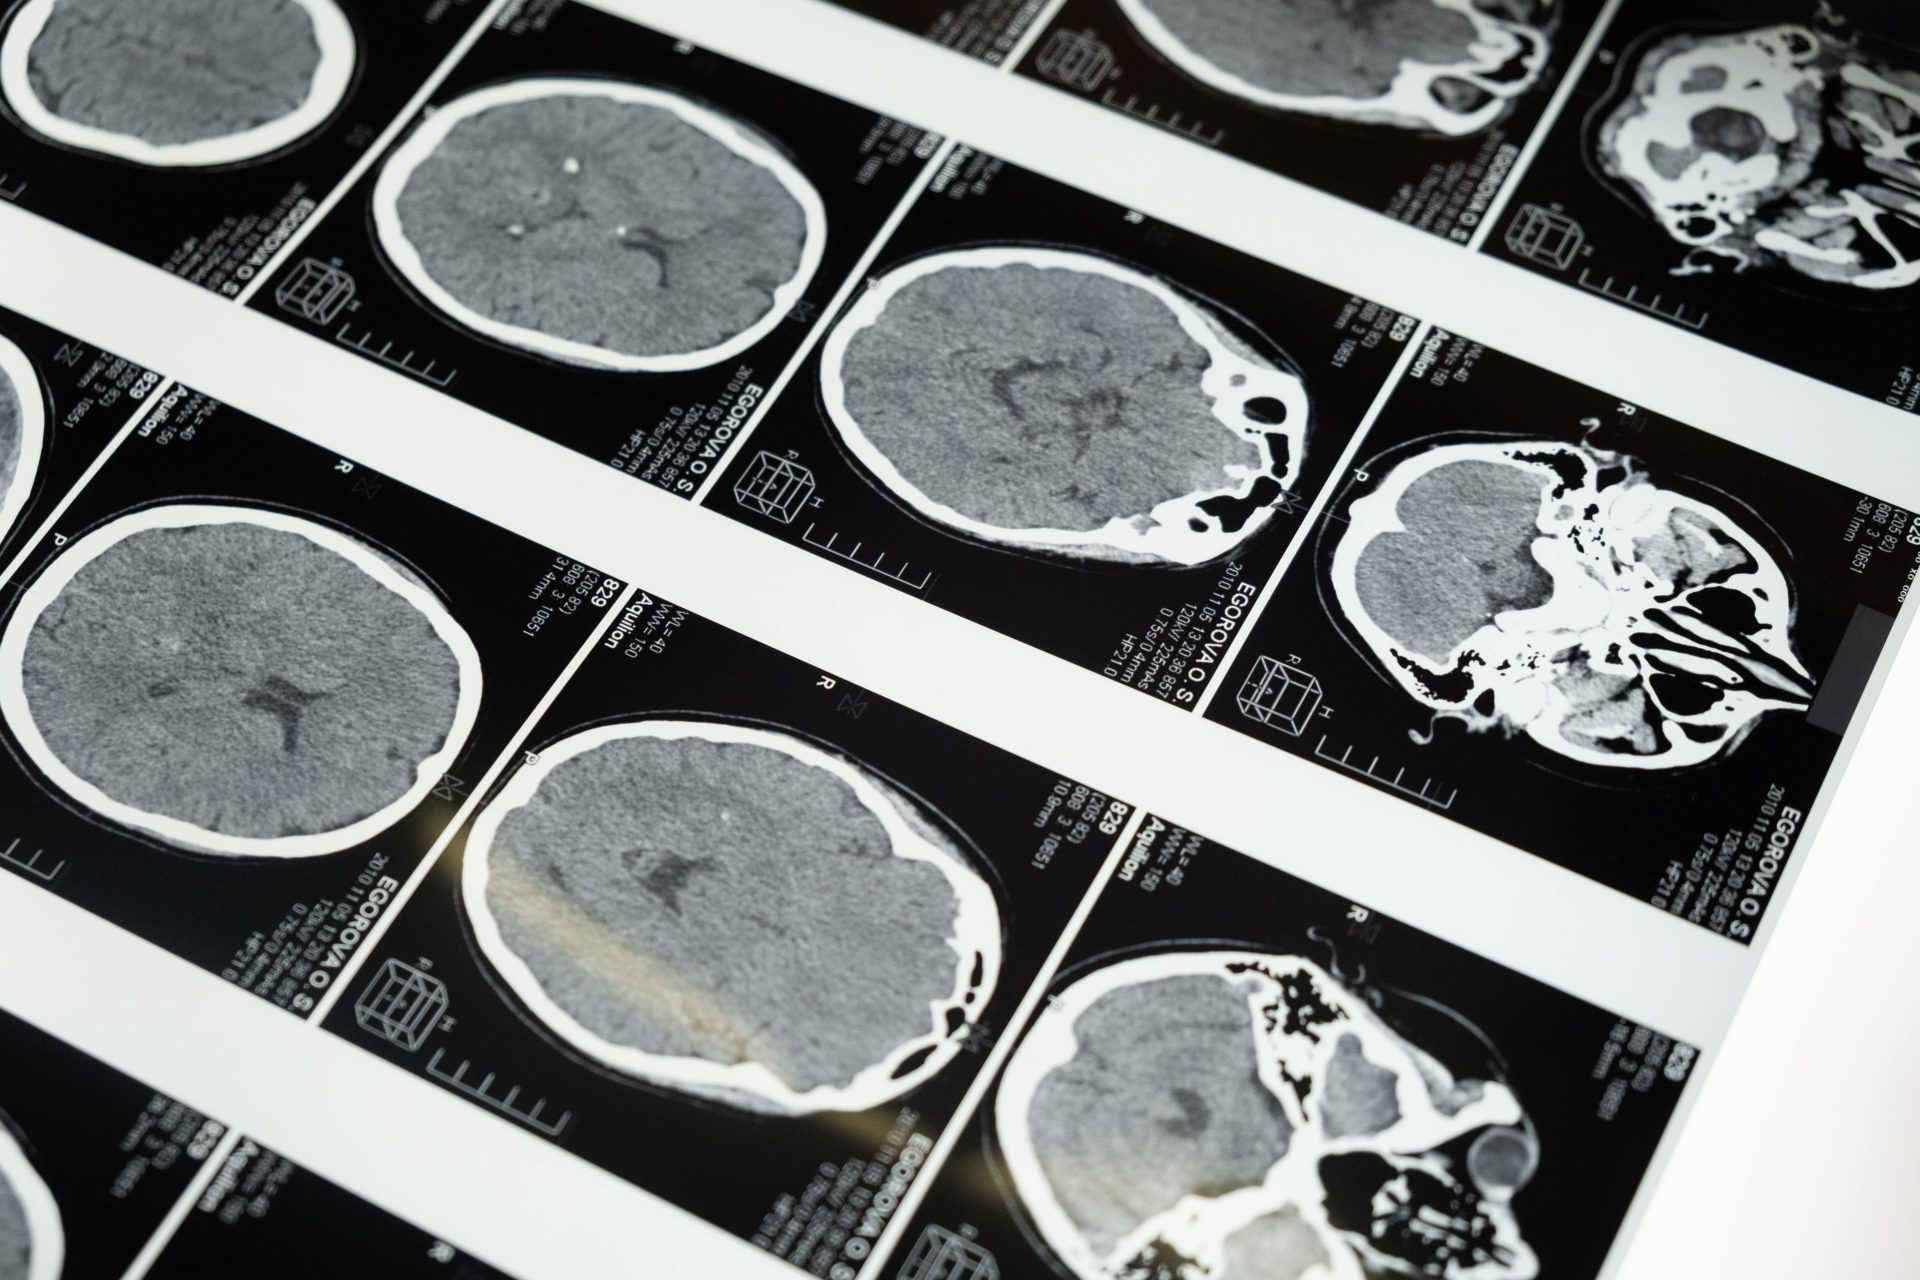 brain-injury-pictures-black-white